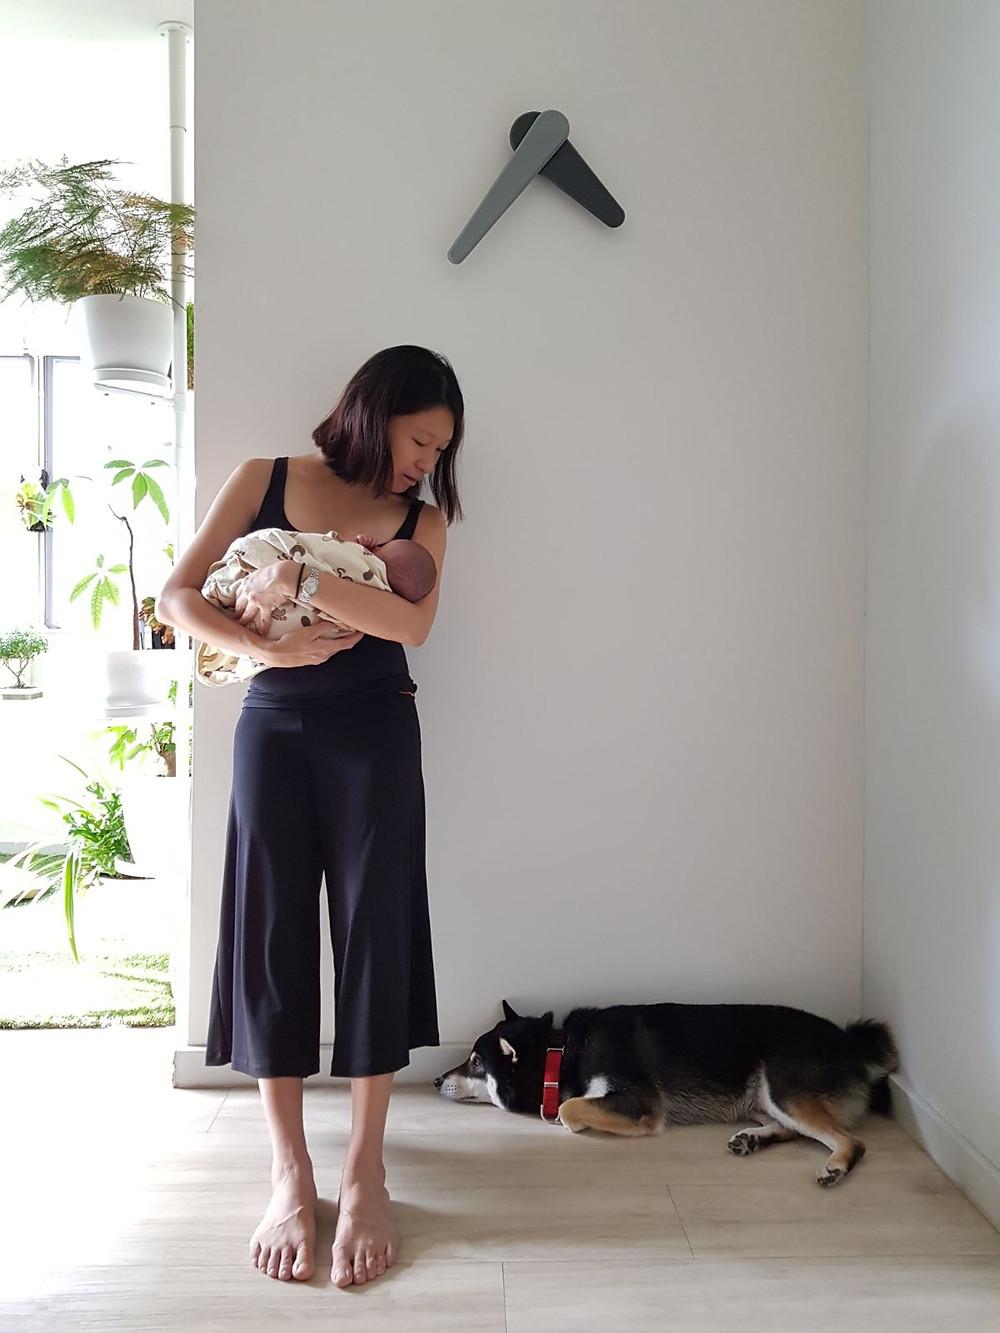 Baby-2-dog Intro